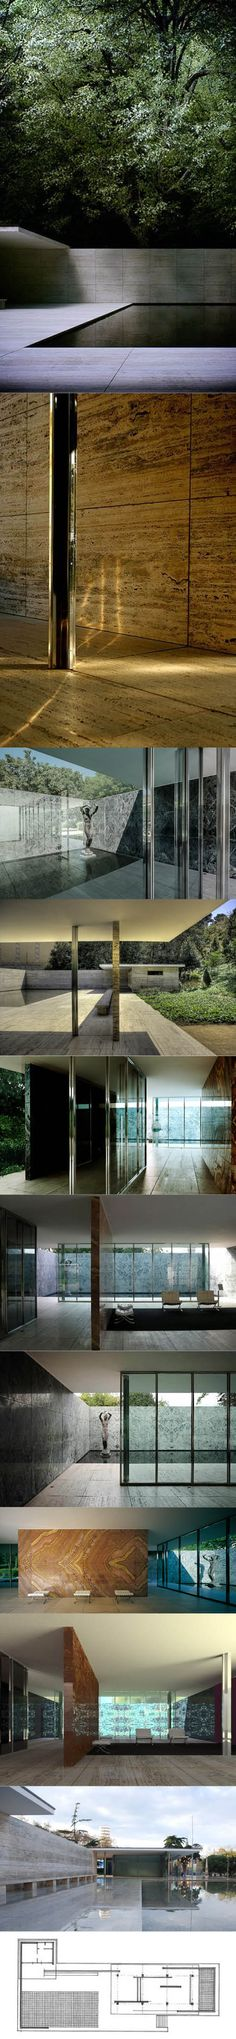 1929 Mies van der Rohe - Barcelona Pavilion / Spain / Germany / travertine steel concrete glass / cultural